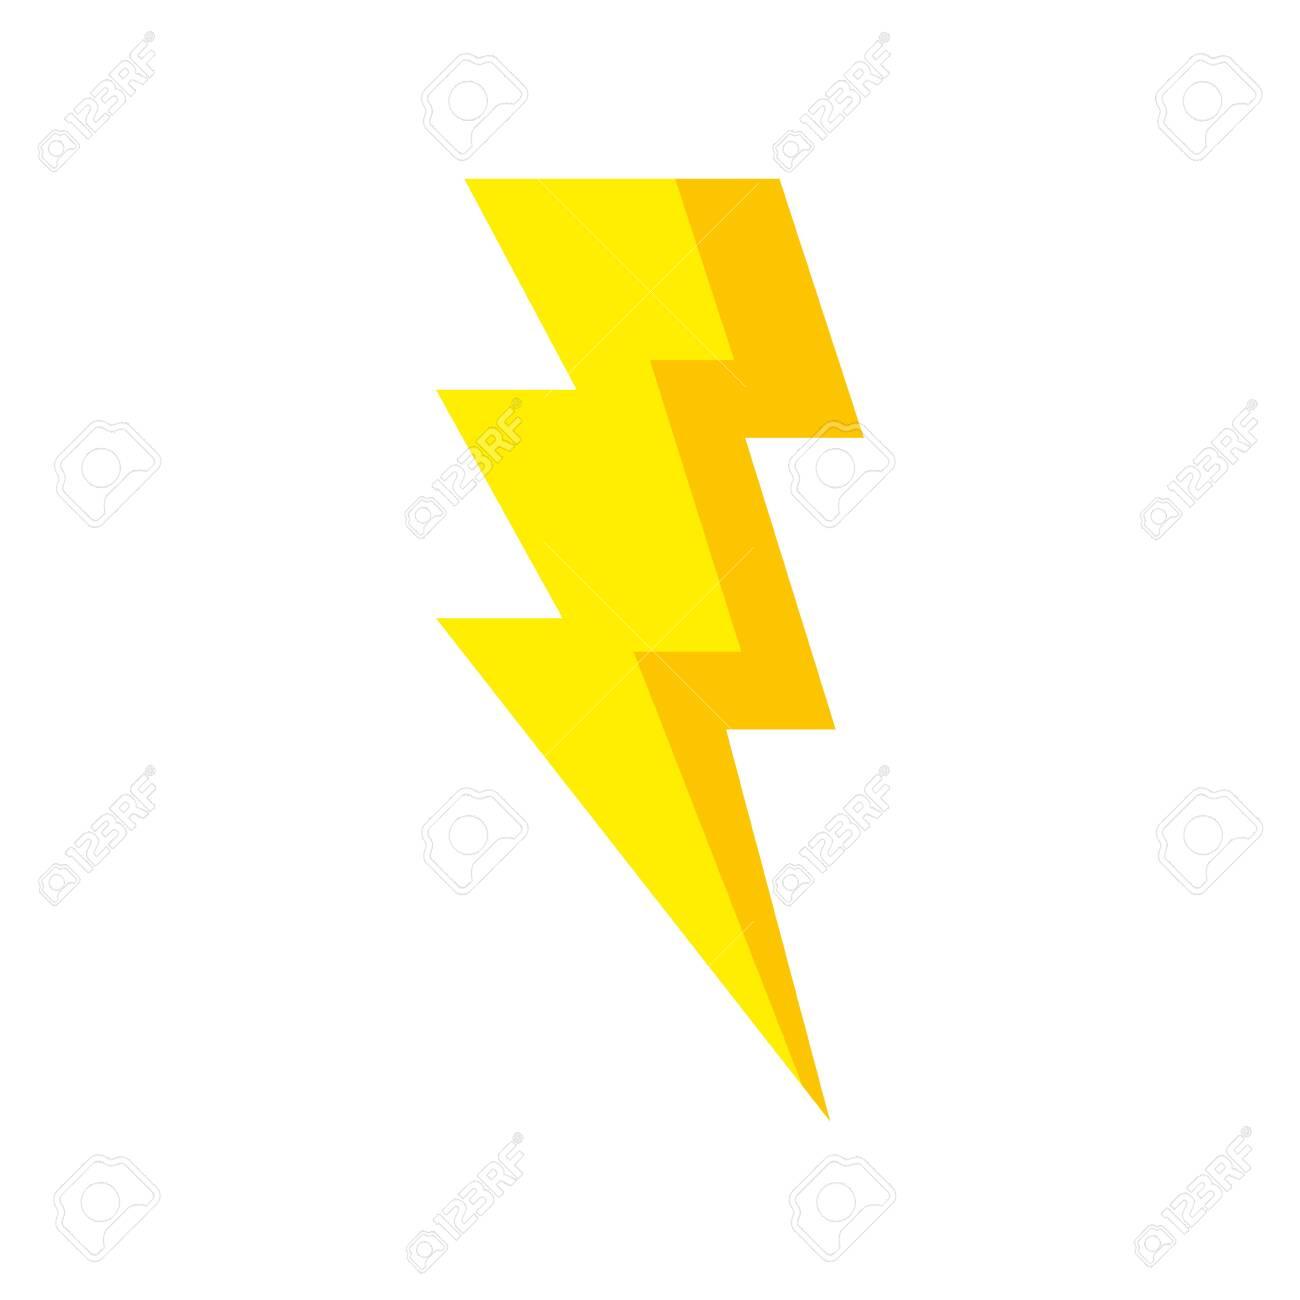 thunderbolt pop art style icon vector illustration design - 137415930